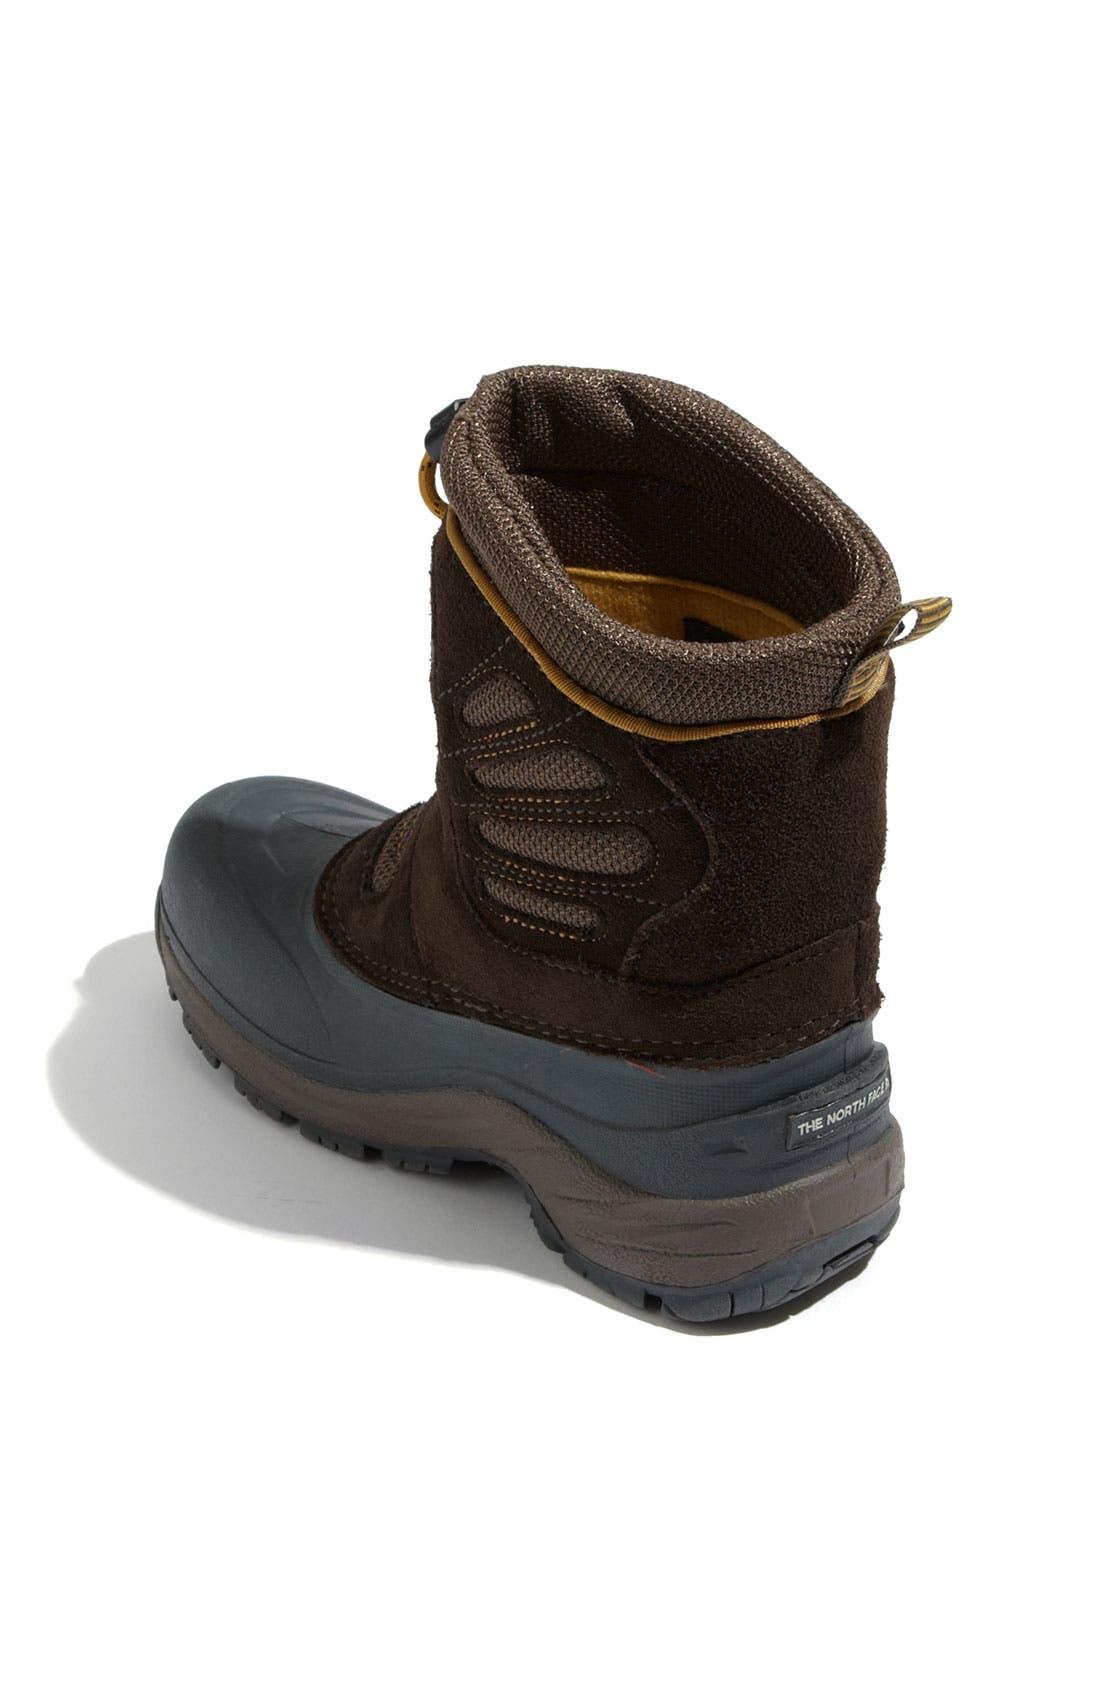 Alternate Image 2  - The North Face 'Snow Plough' Boot (Little Kids & Big Kids)